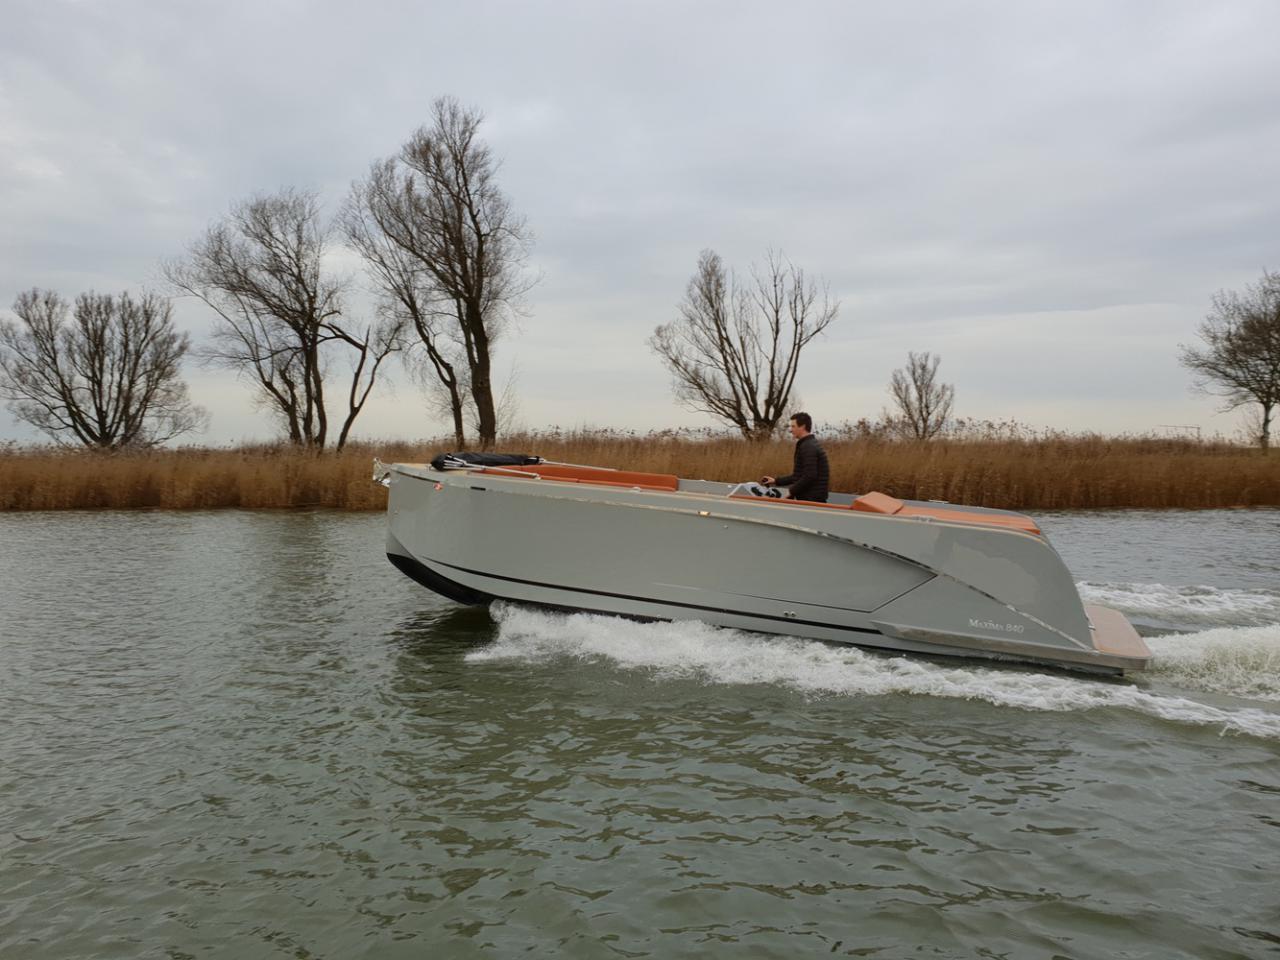 Maxima 840 tender 46